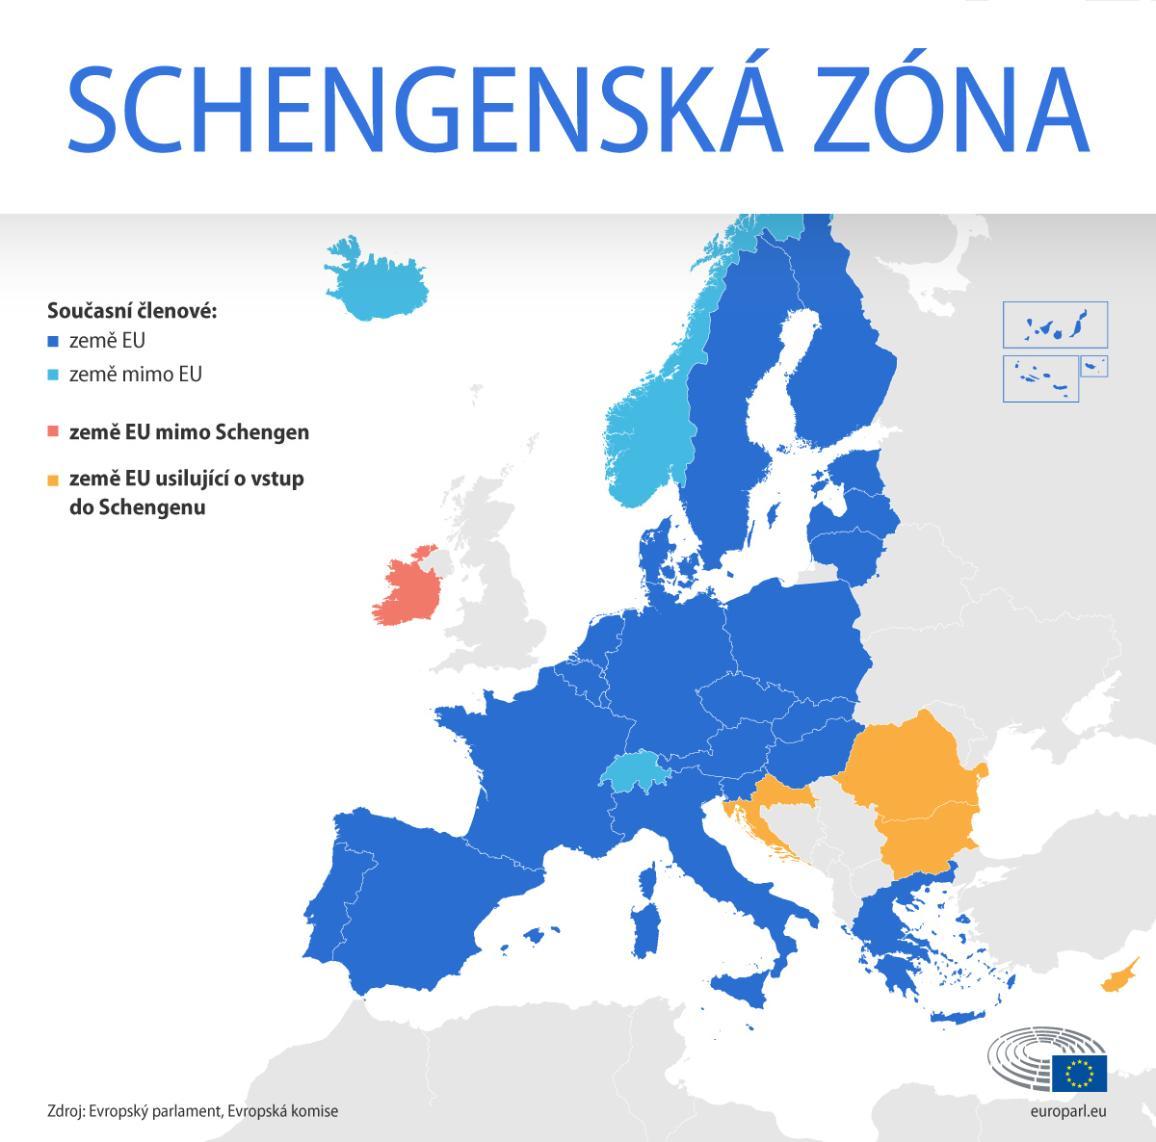 Schengenský prostor